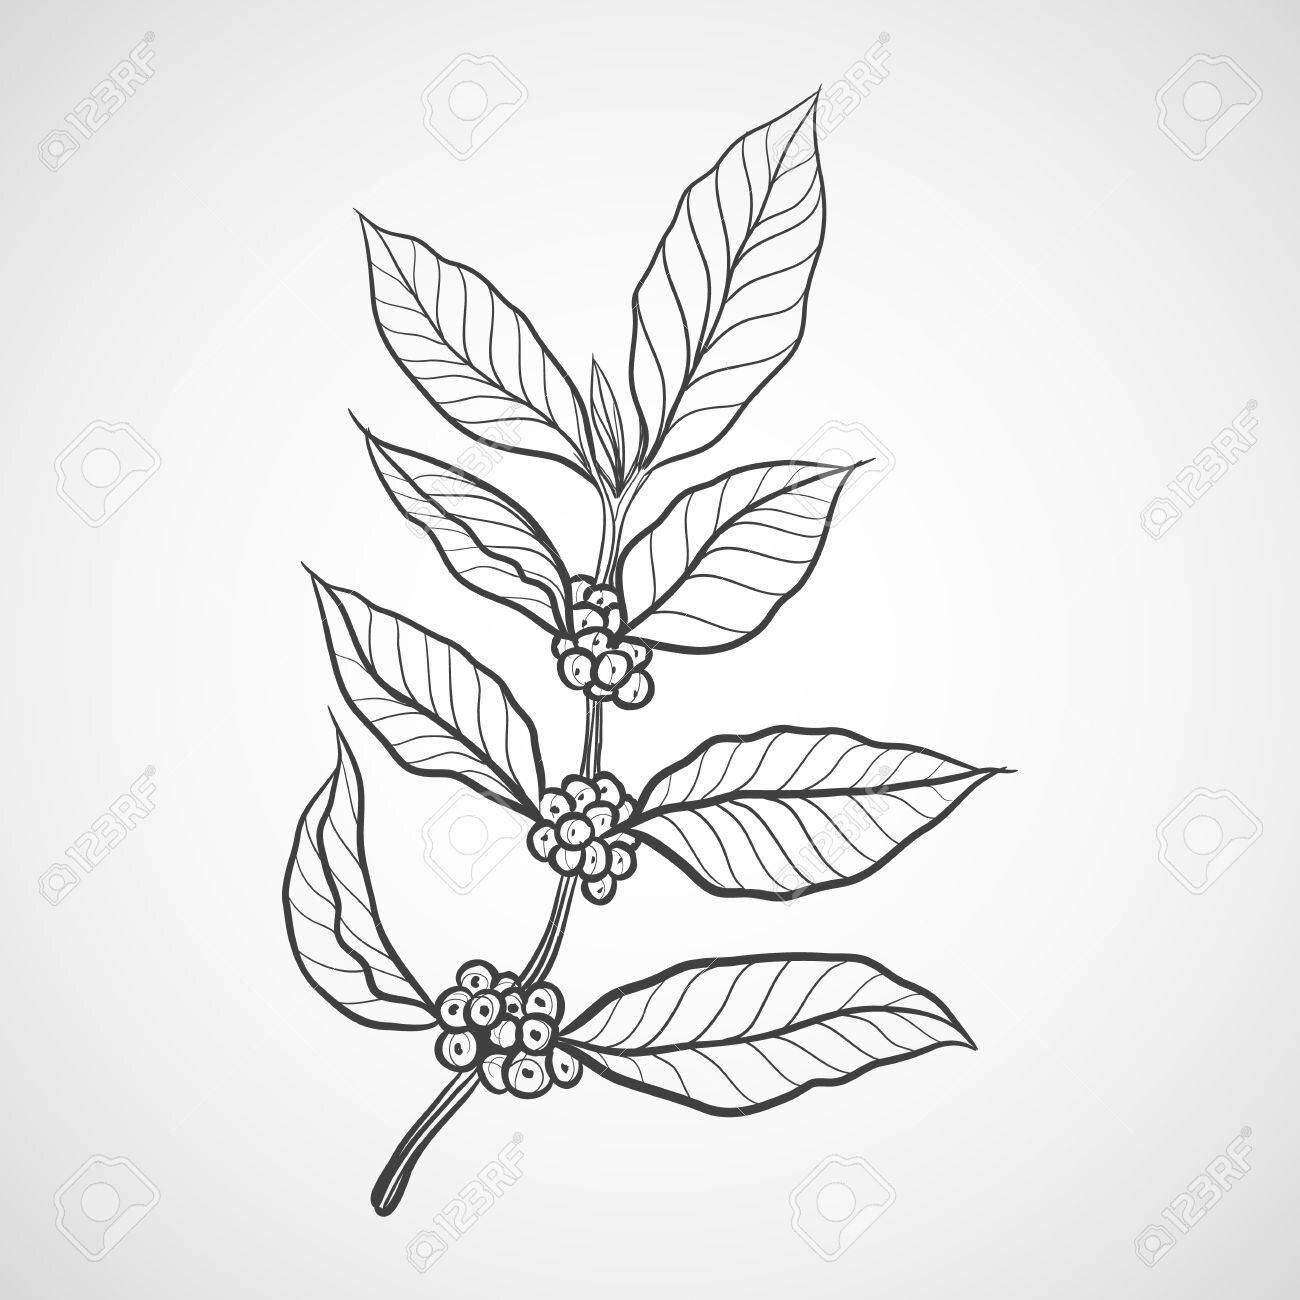 coffee leaf.jpg